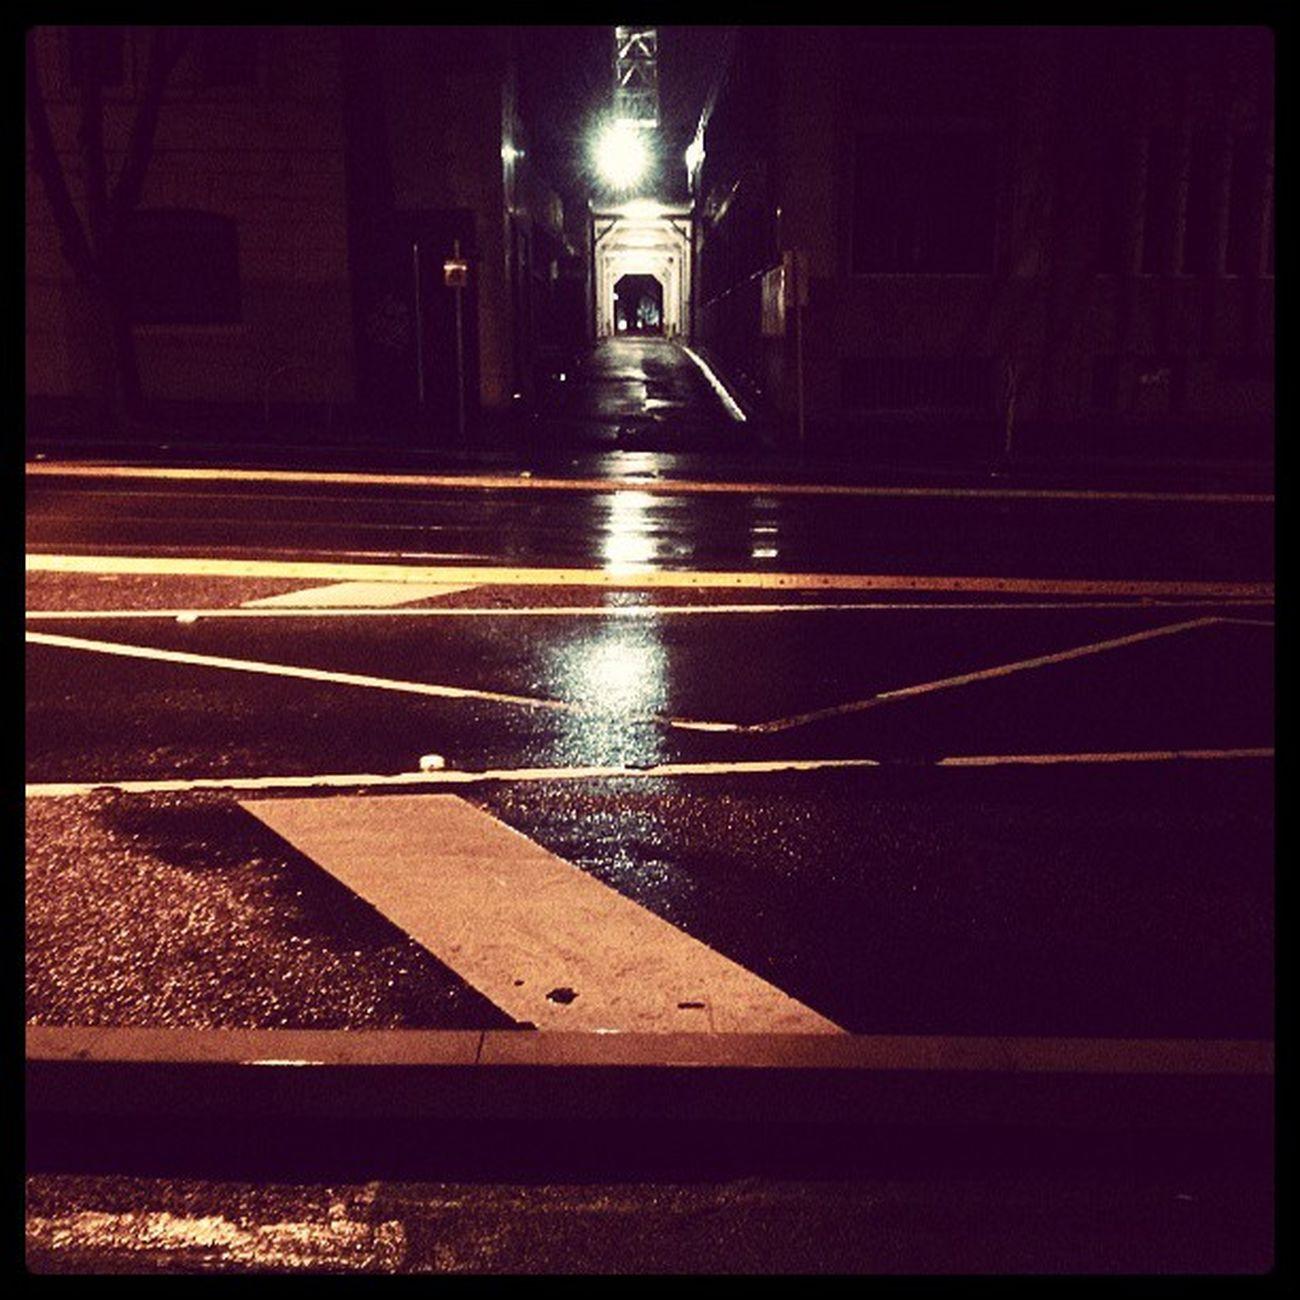 Rainy night a-again